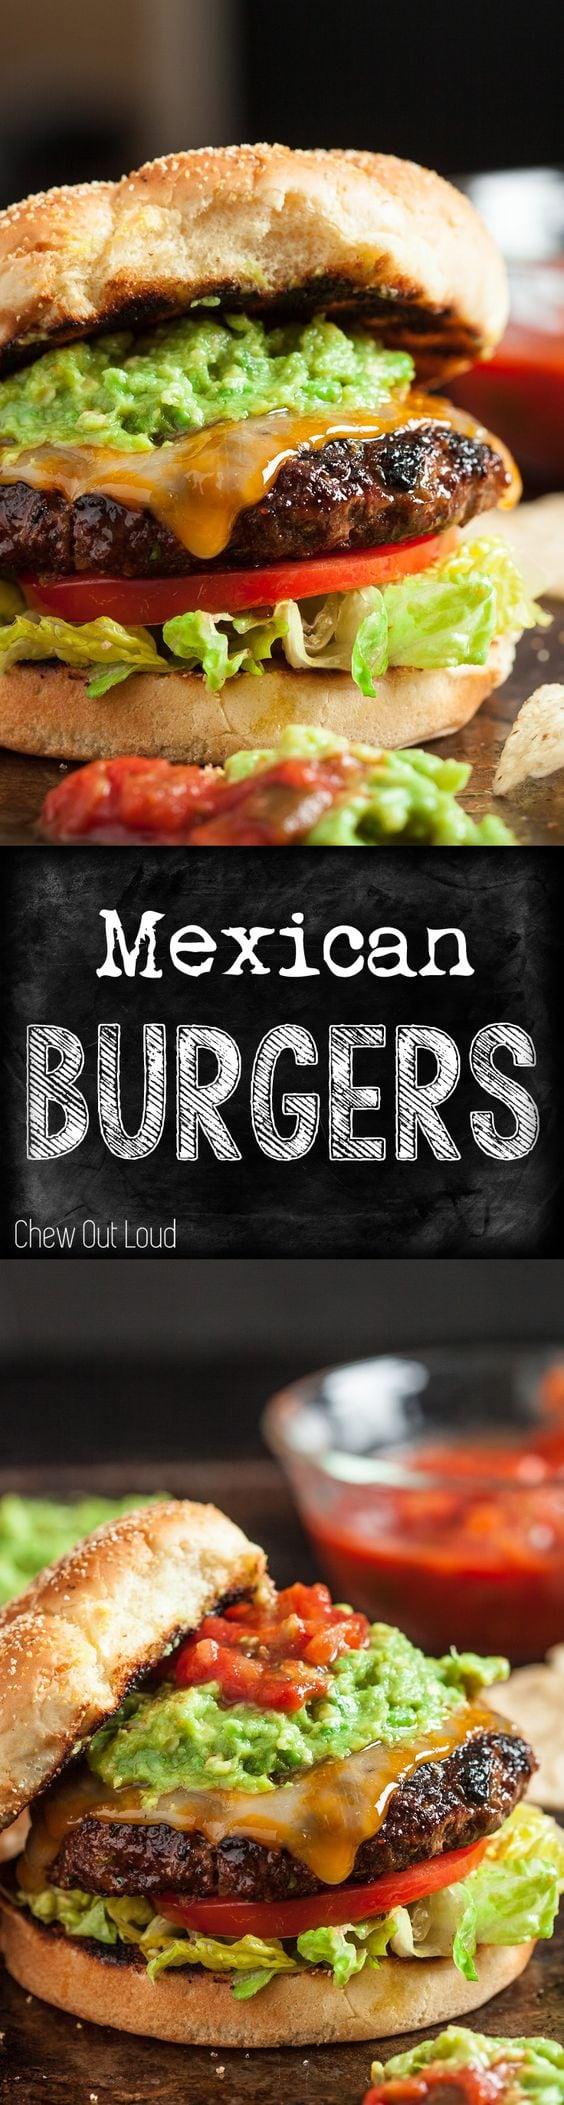 Mexican Cheeseburgers